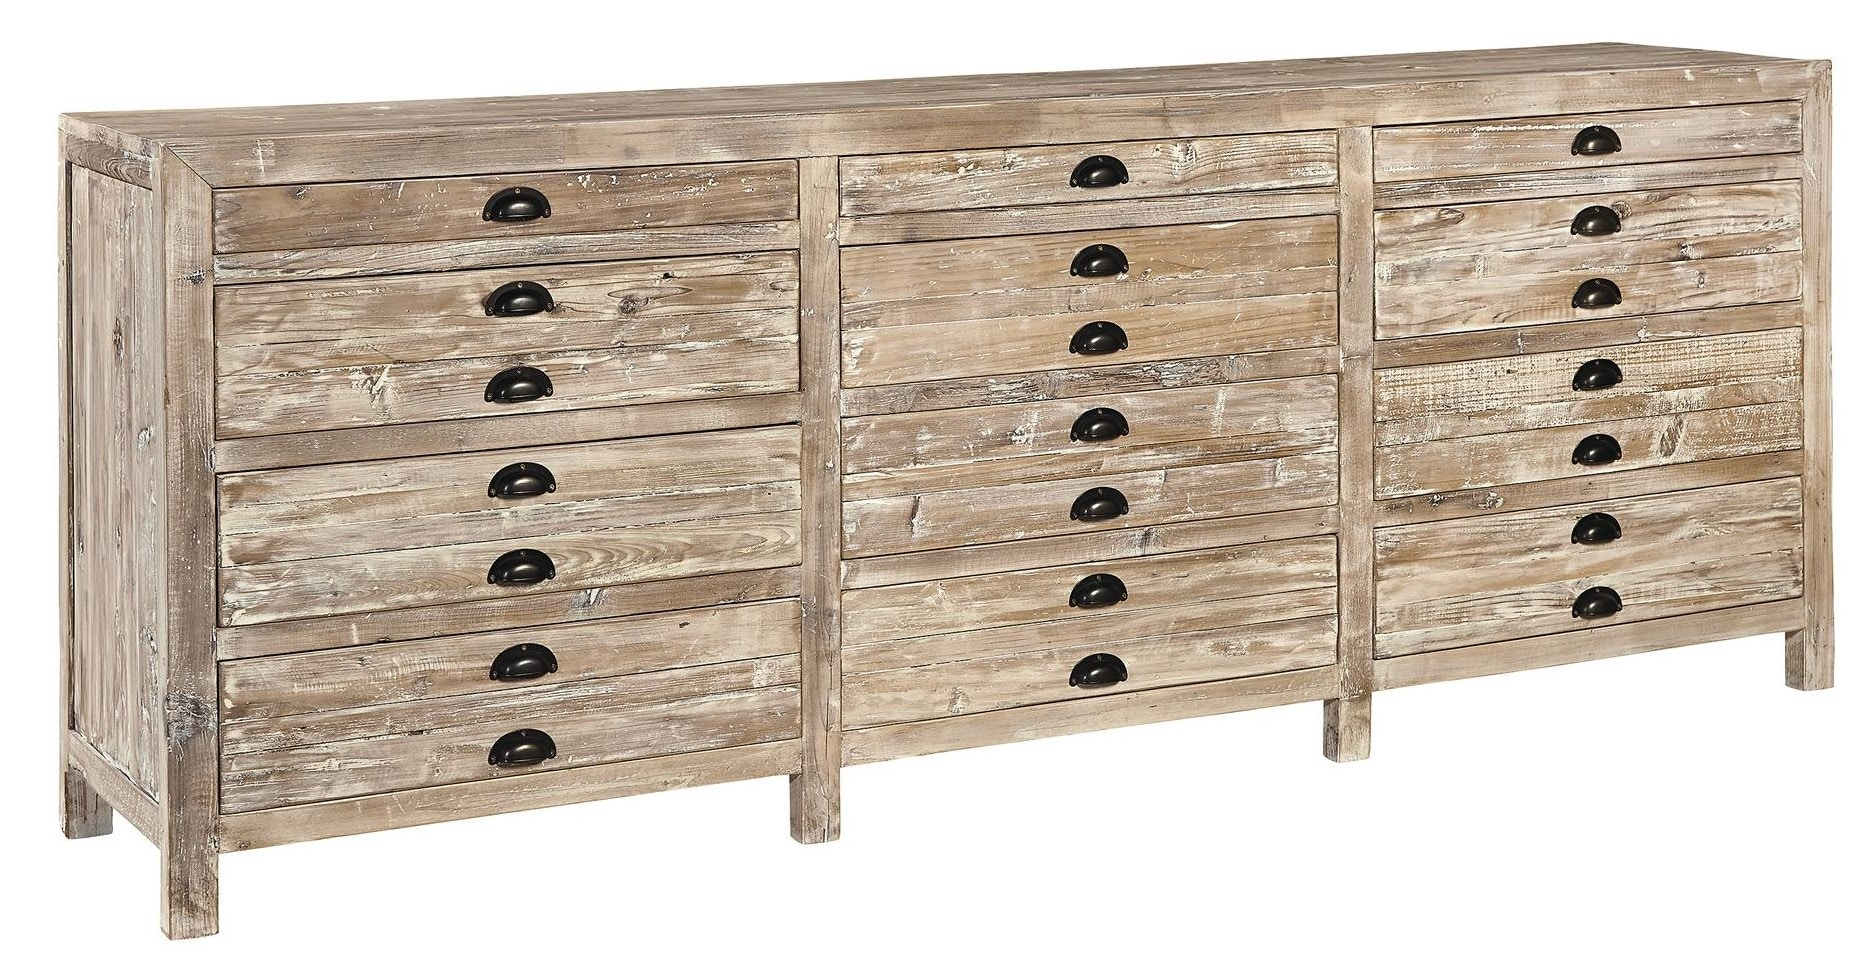 Superieur Furniture Classics Living Room Apothecary Chest 84223   LA Waters Furniture    Statesboro, GA